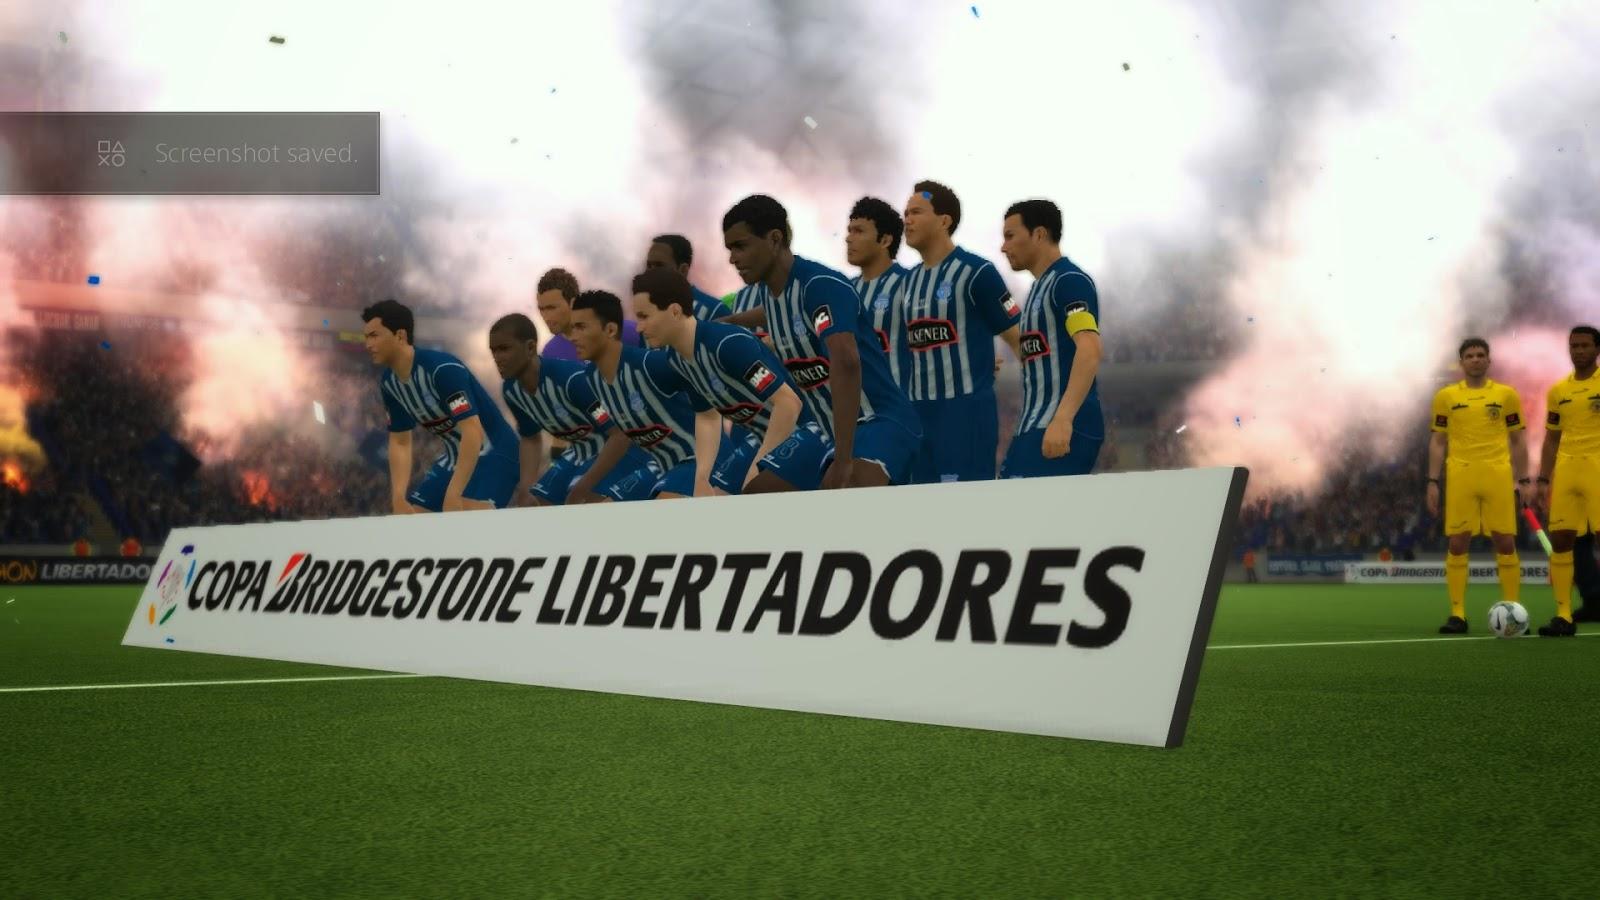 Bridgestone, en alianza con Konami, presenta la Pro Evolution Soccer (PES) Copa Bridgestone Libertadores.